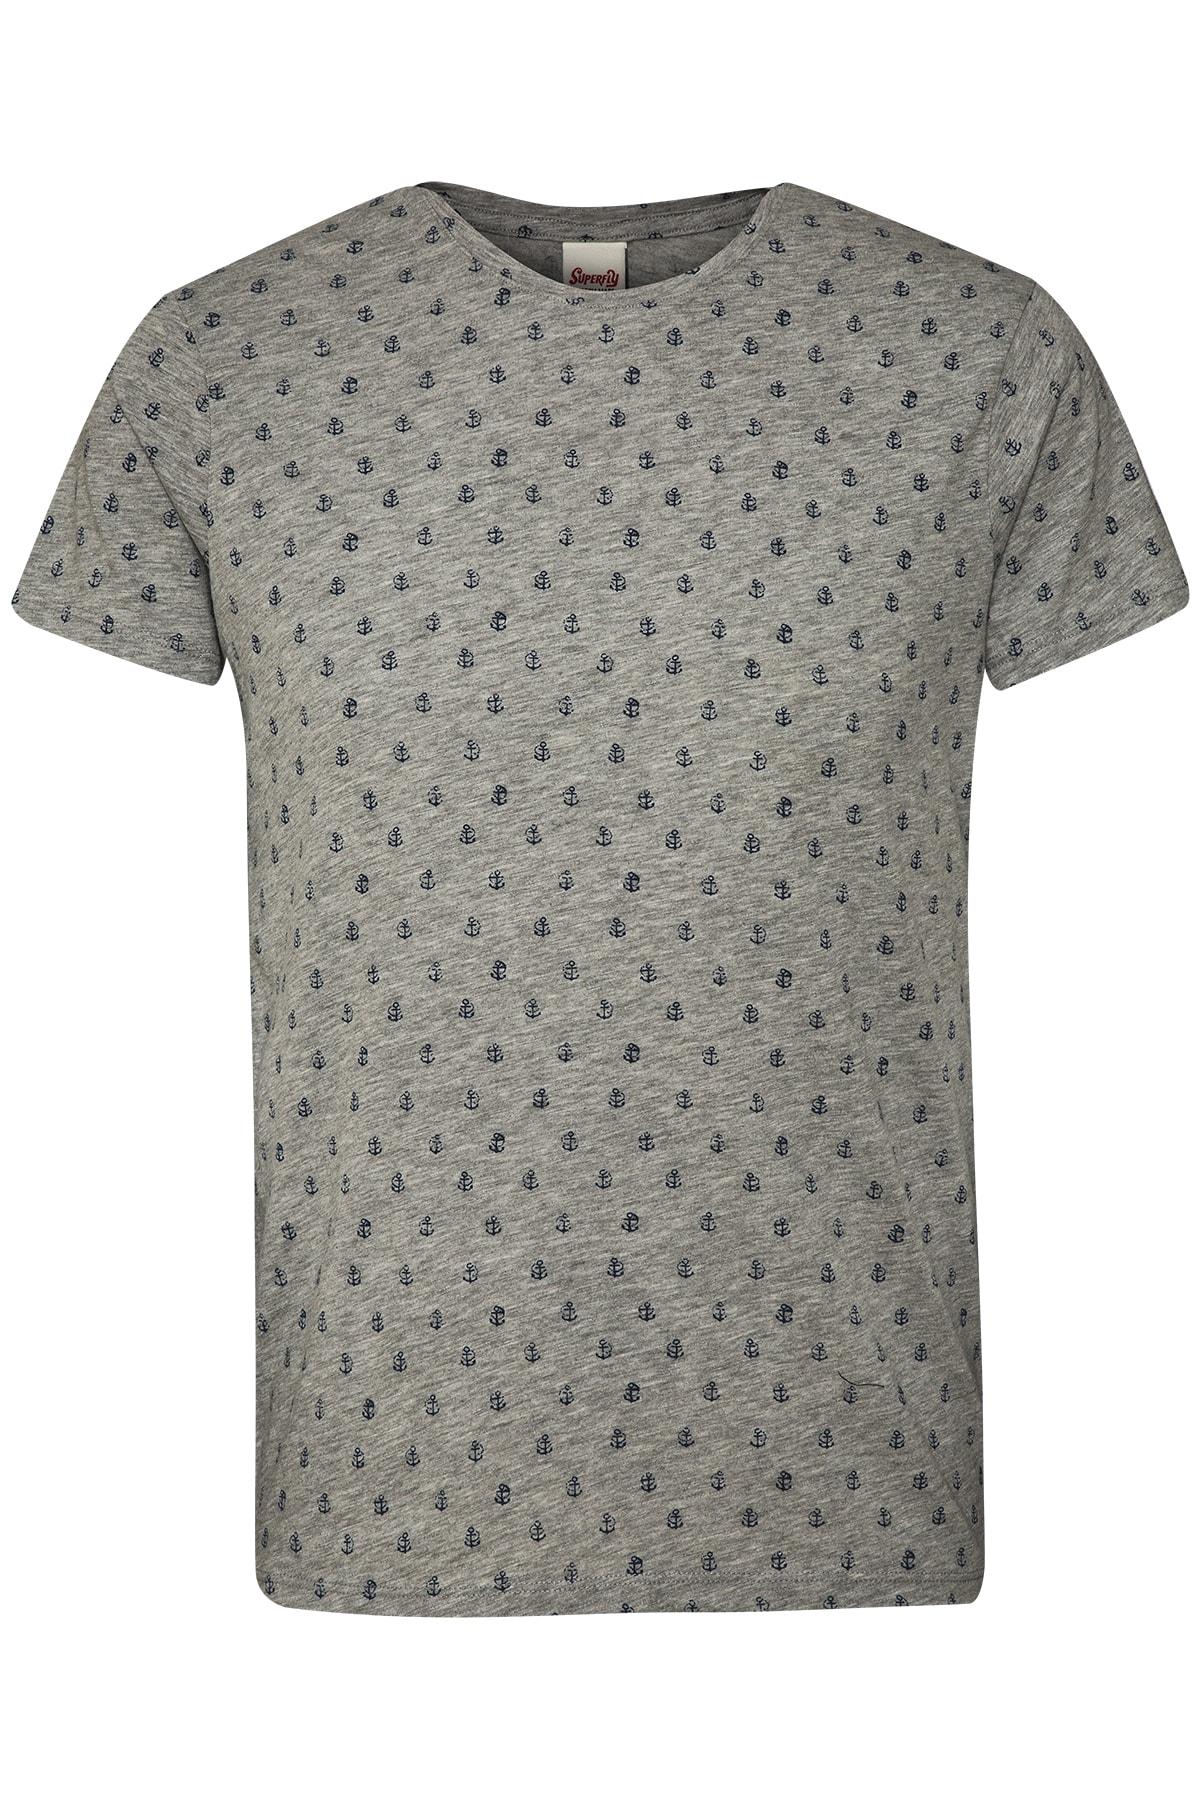 Superfly Erkek Gri Desenli T-Shirt 1